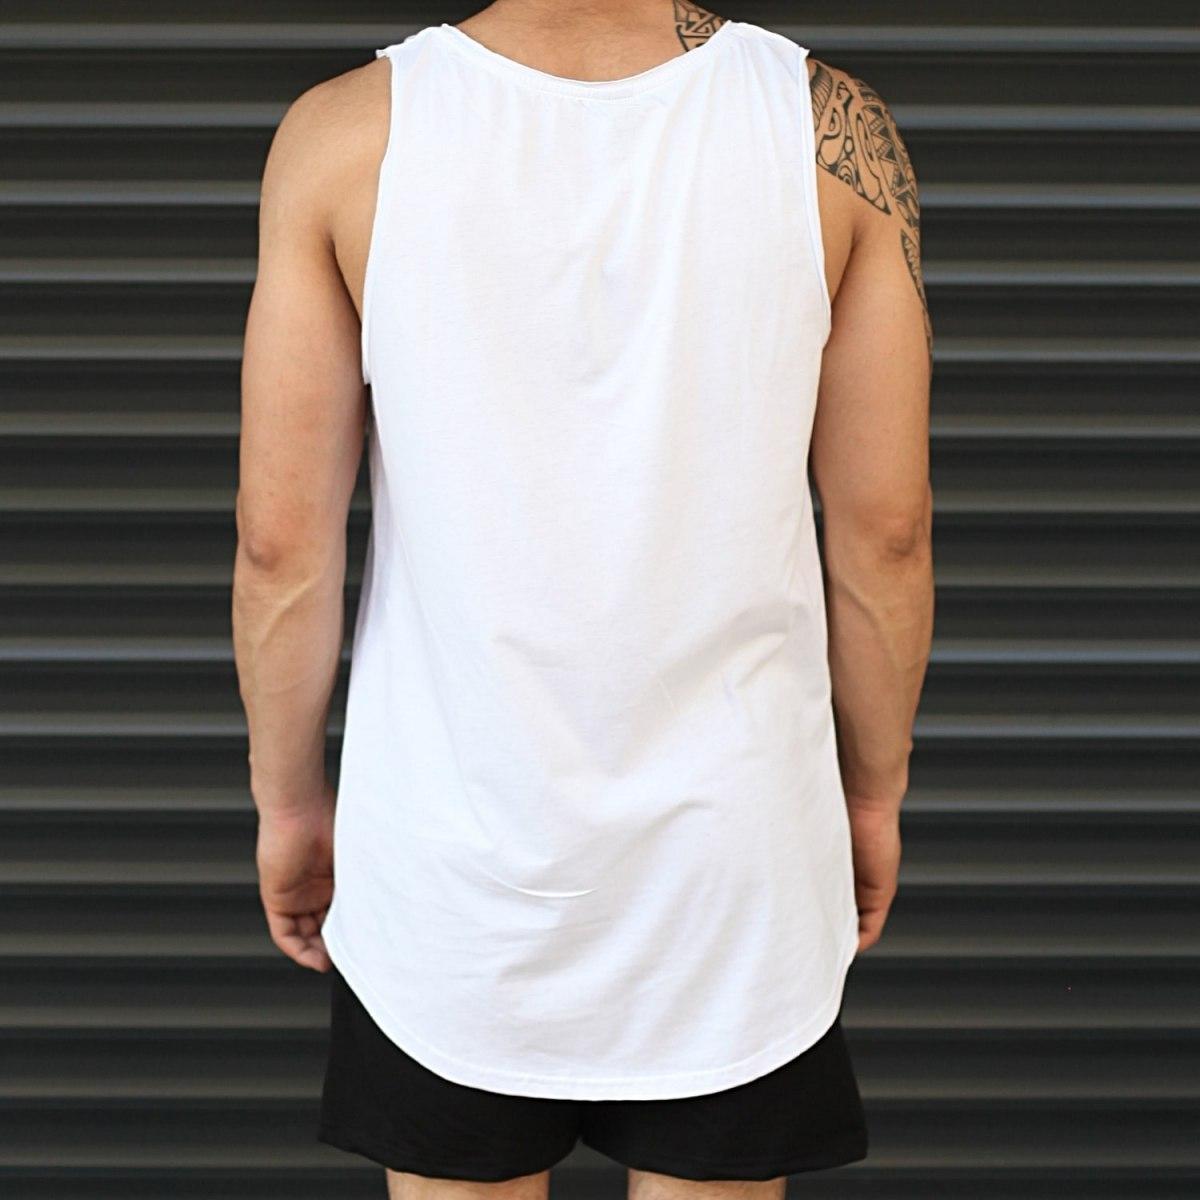 Men's Athletic Sleeveless XX Tall Tank Top White Mv Premium Brand - 3